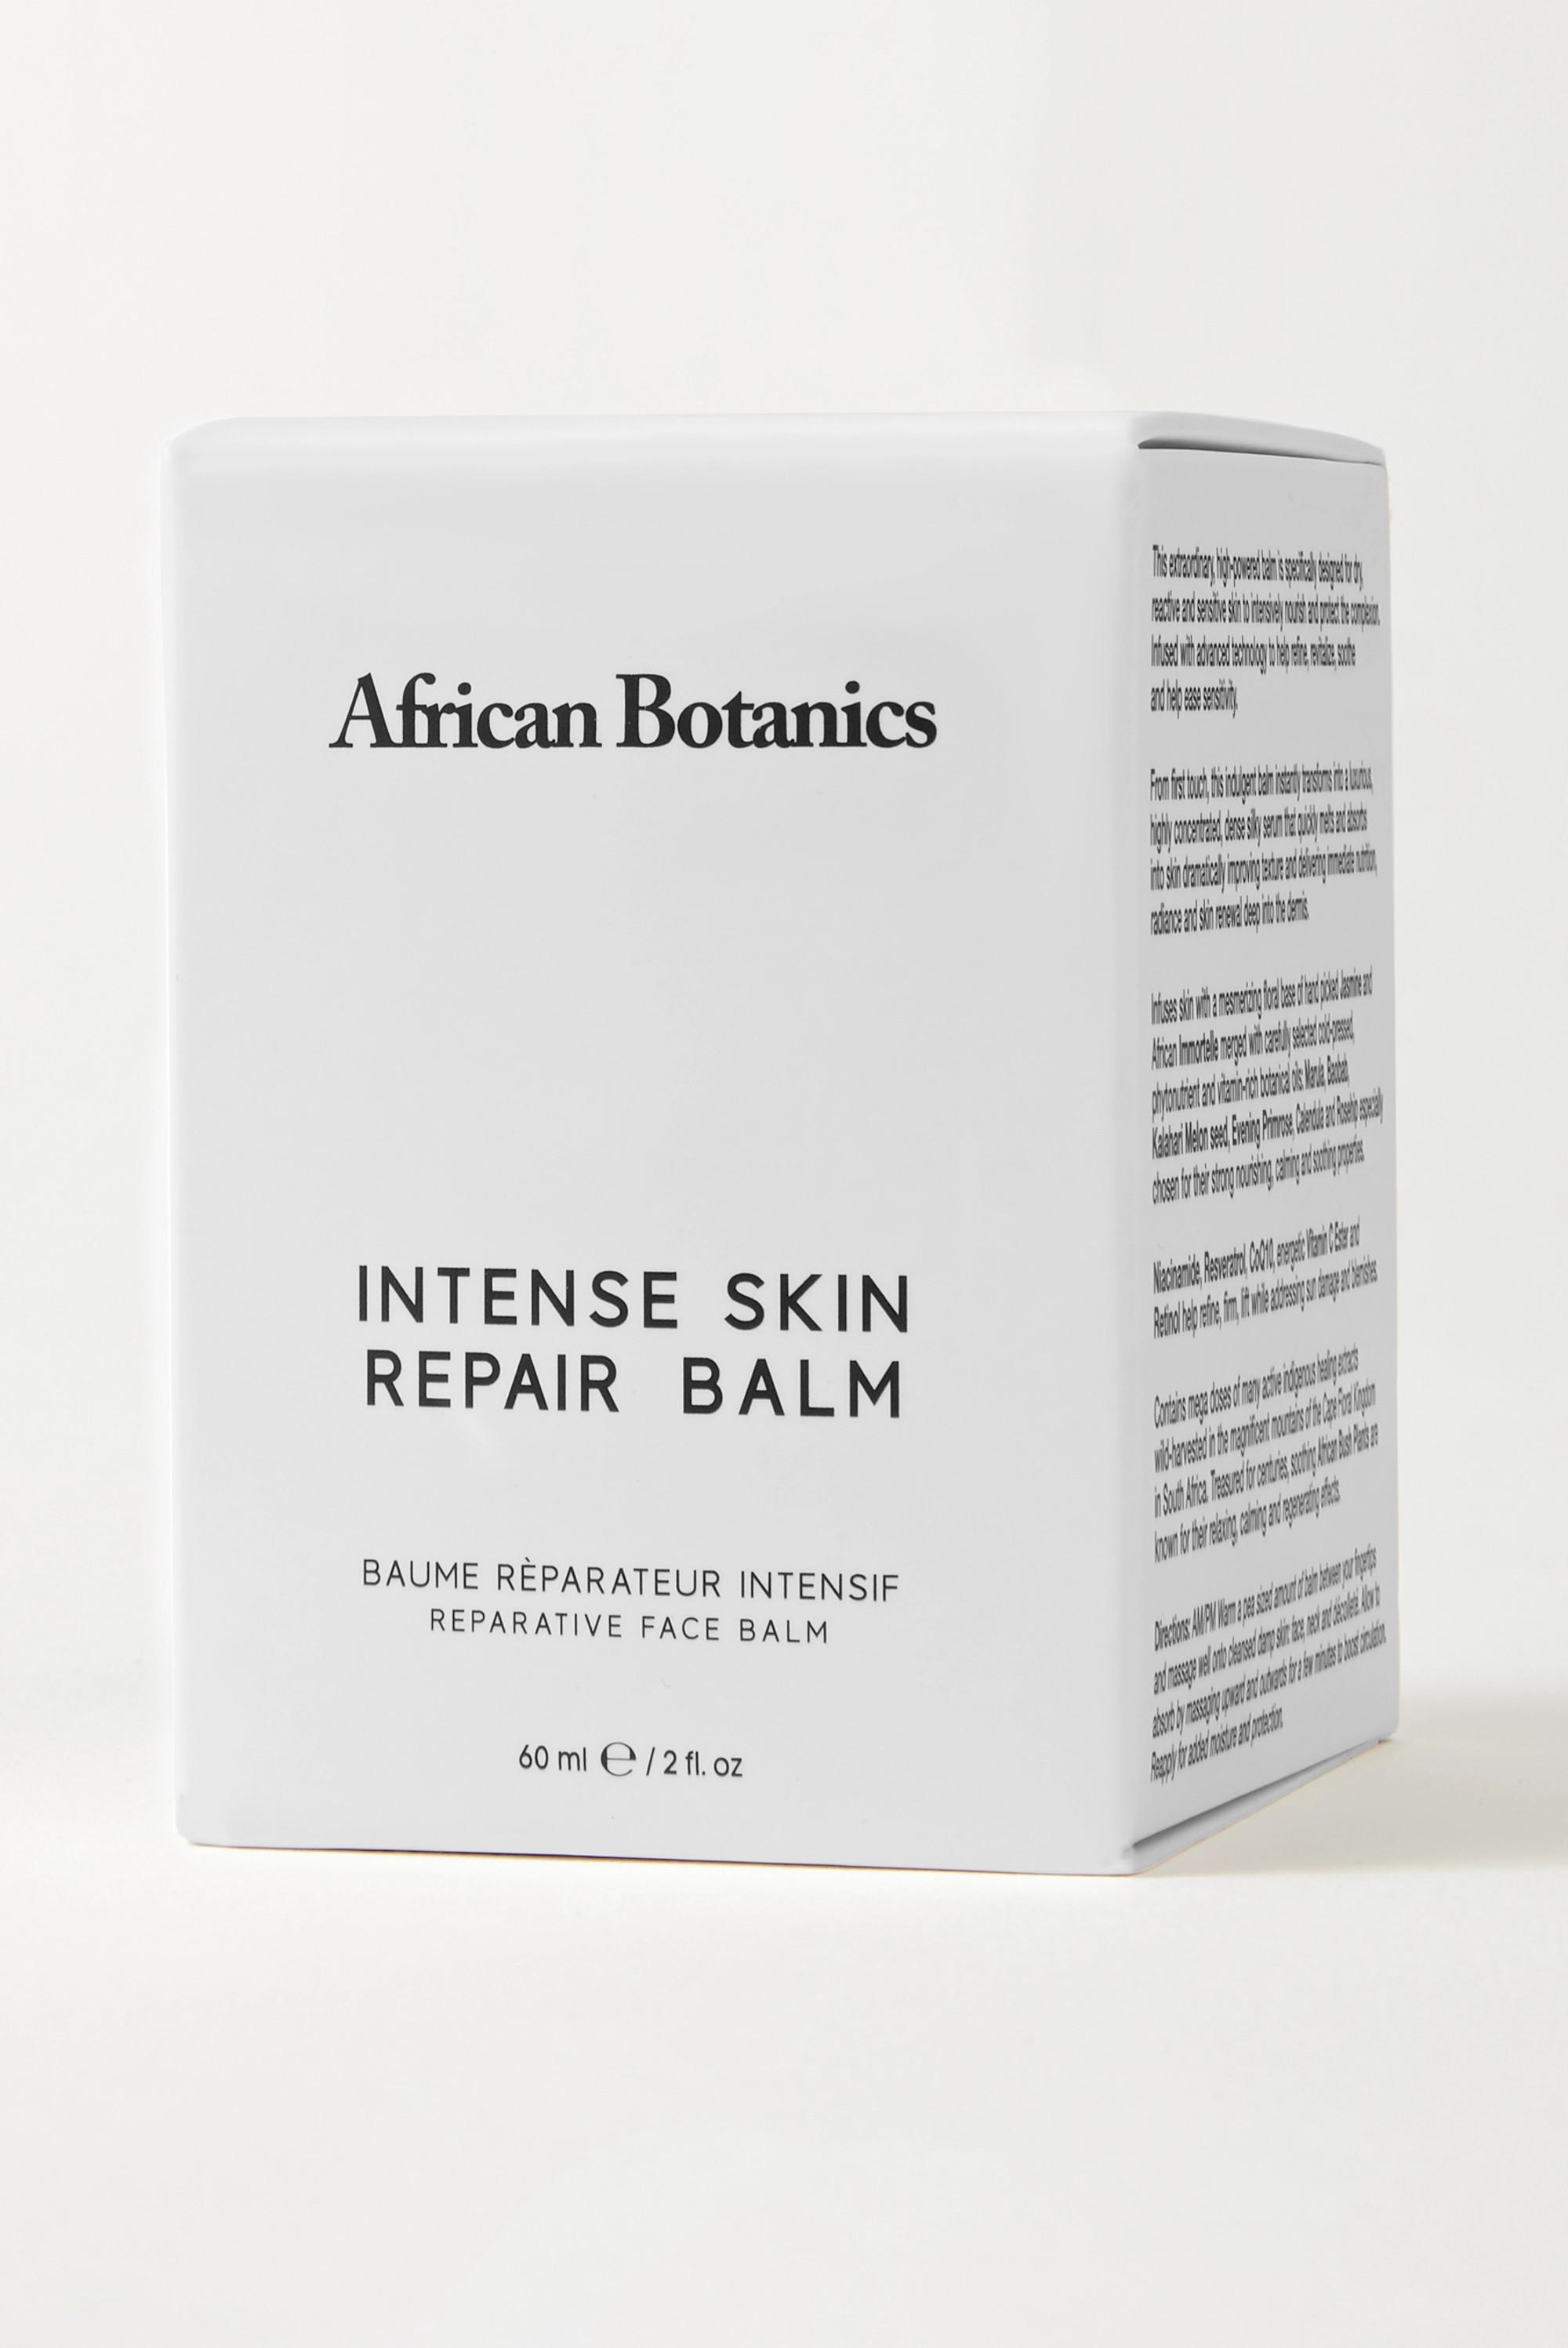 African Botanics Intense Skin Repair Balm, 60ml